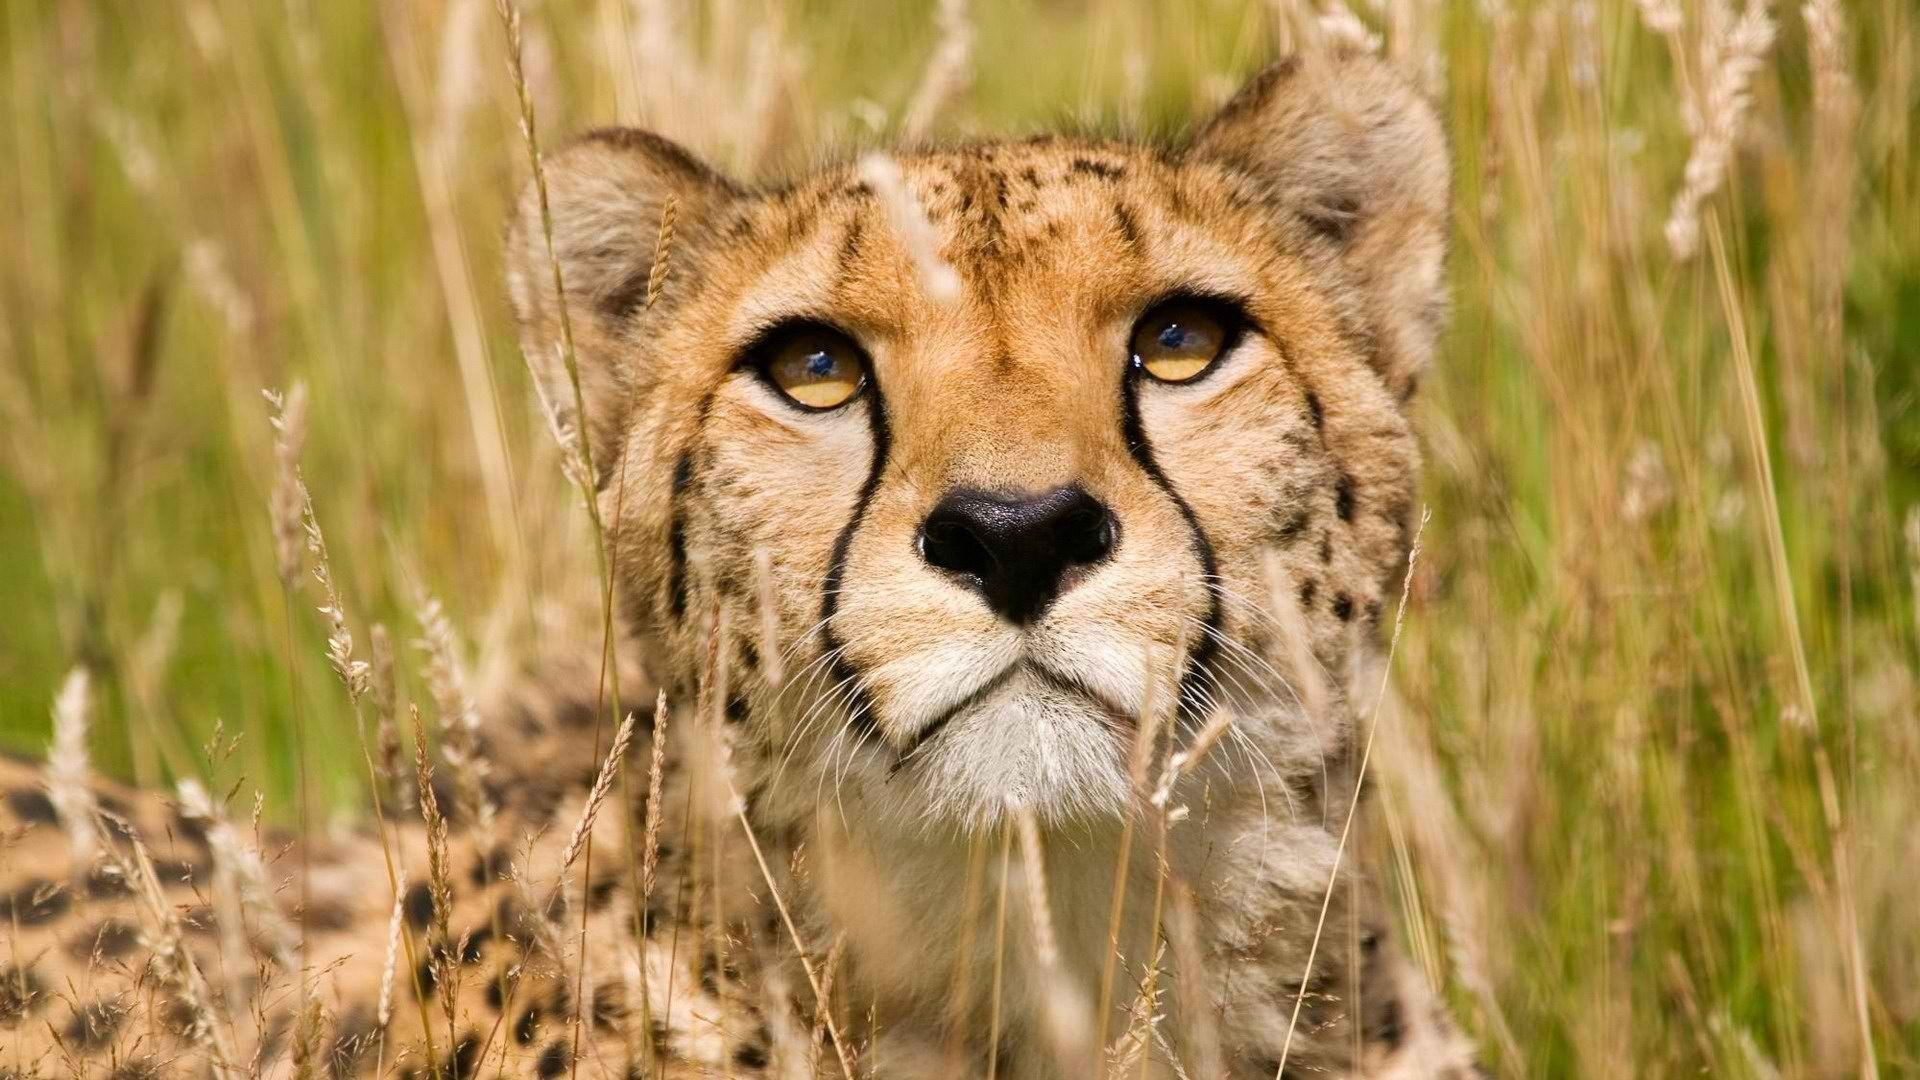 Animals, Grass, Wildlife, Cheetahs Wallpapers